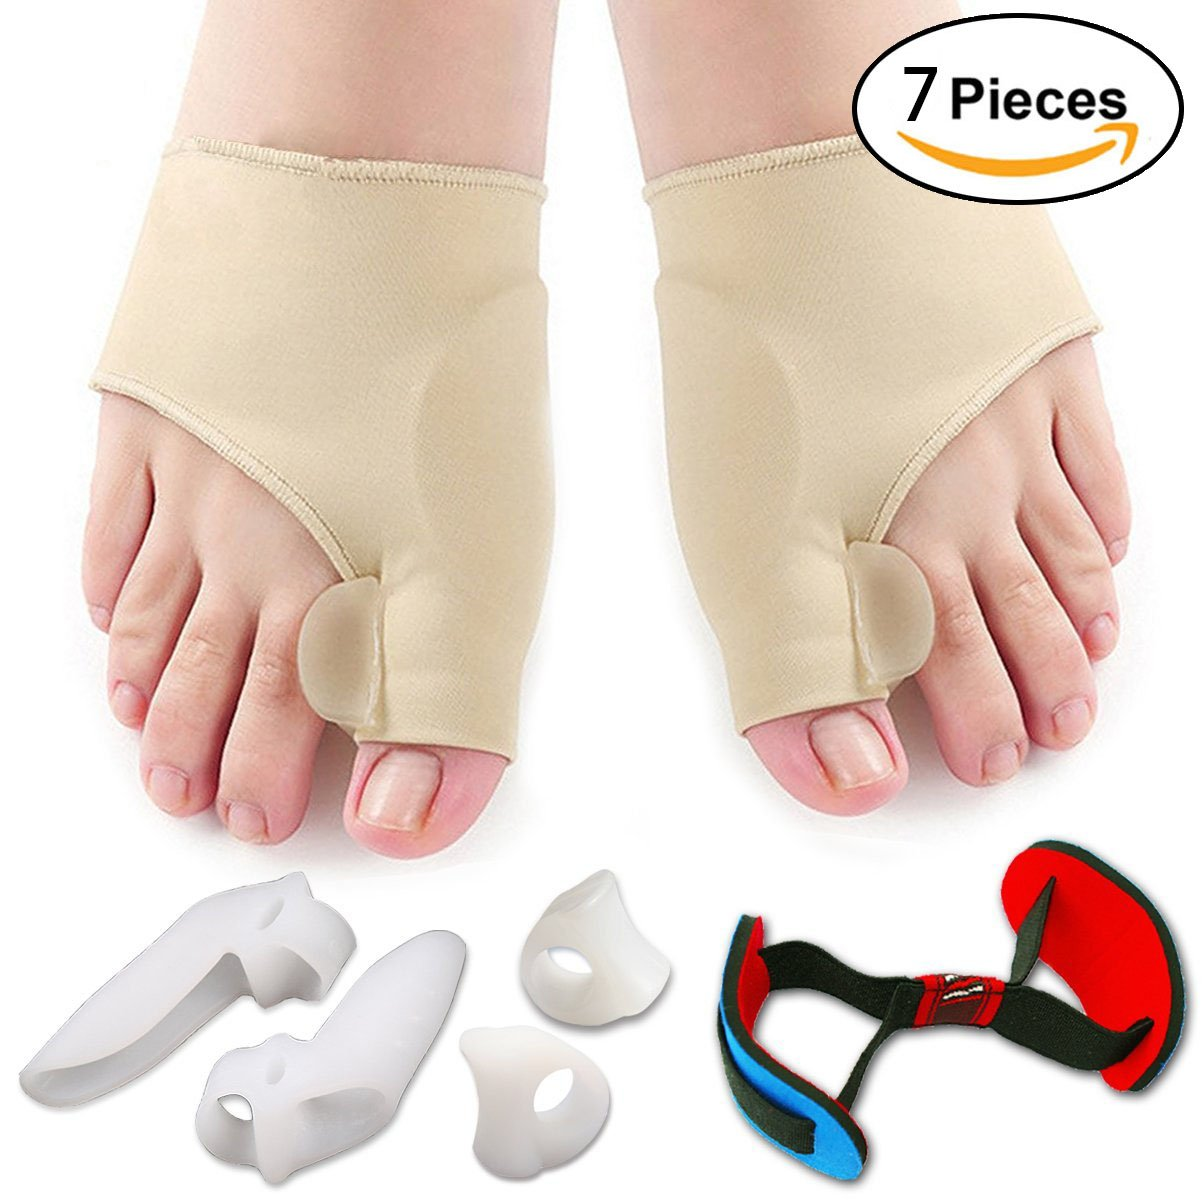 Bunion Corrector & Bunion Relief Protector Sleeves Kit for Men Women,Treat Pain in Hallux Valgus, Big Toe Joint, Hammer Toe, Toe Separators Spacers Straighteners Splint- 7 Pcs